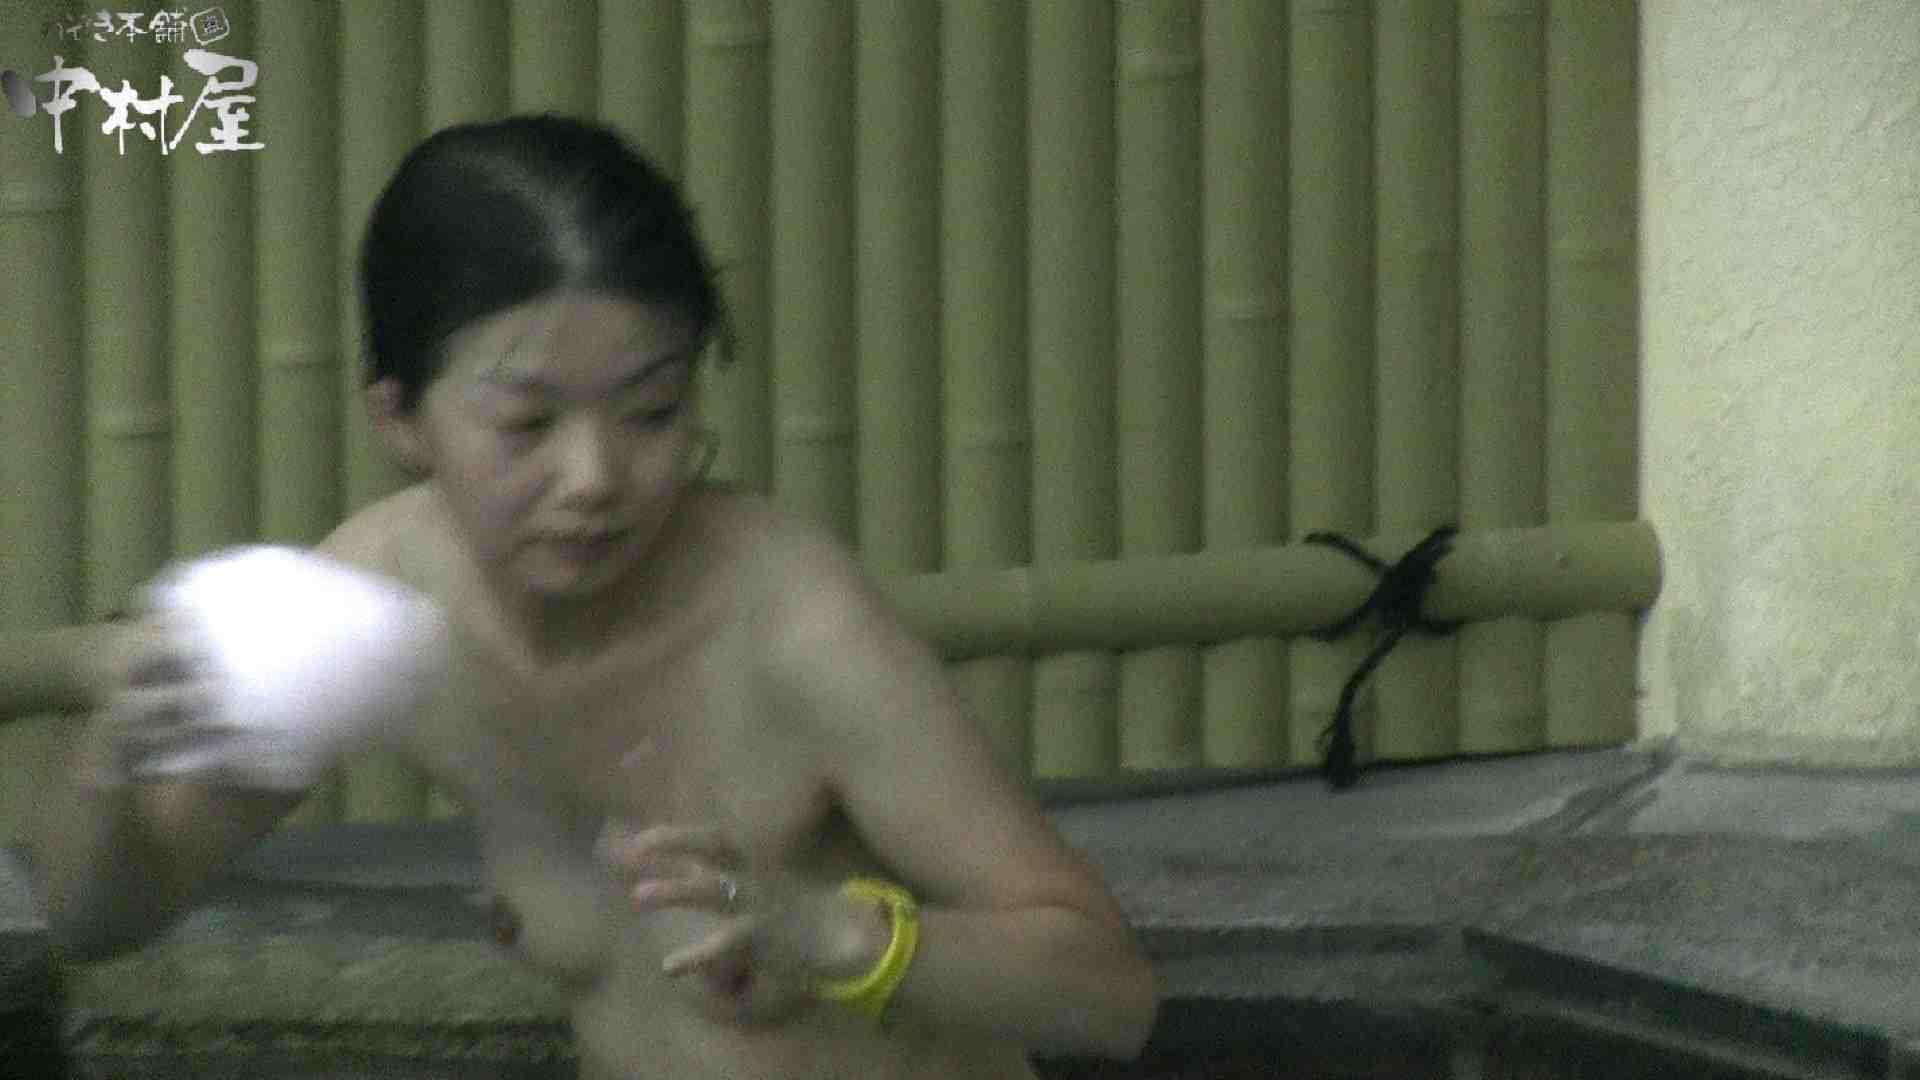 Aquaな露天風呂Vol.904 盗撮師作品  103pic 24